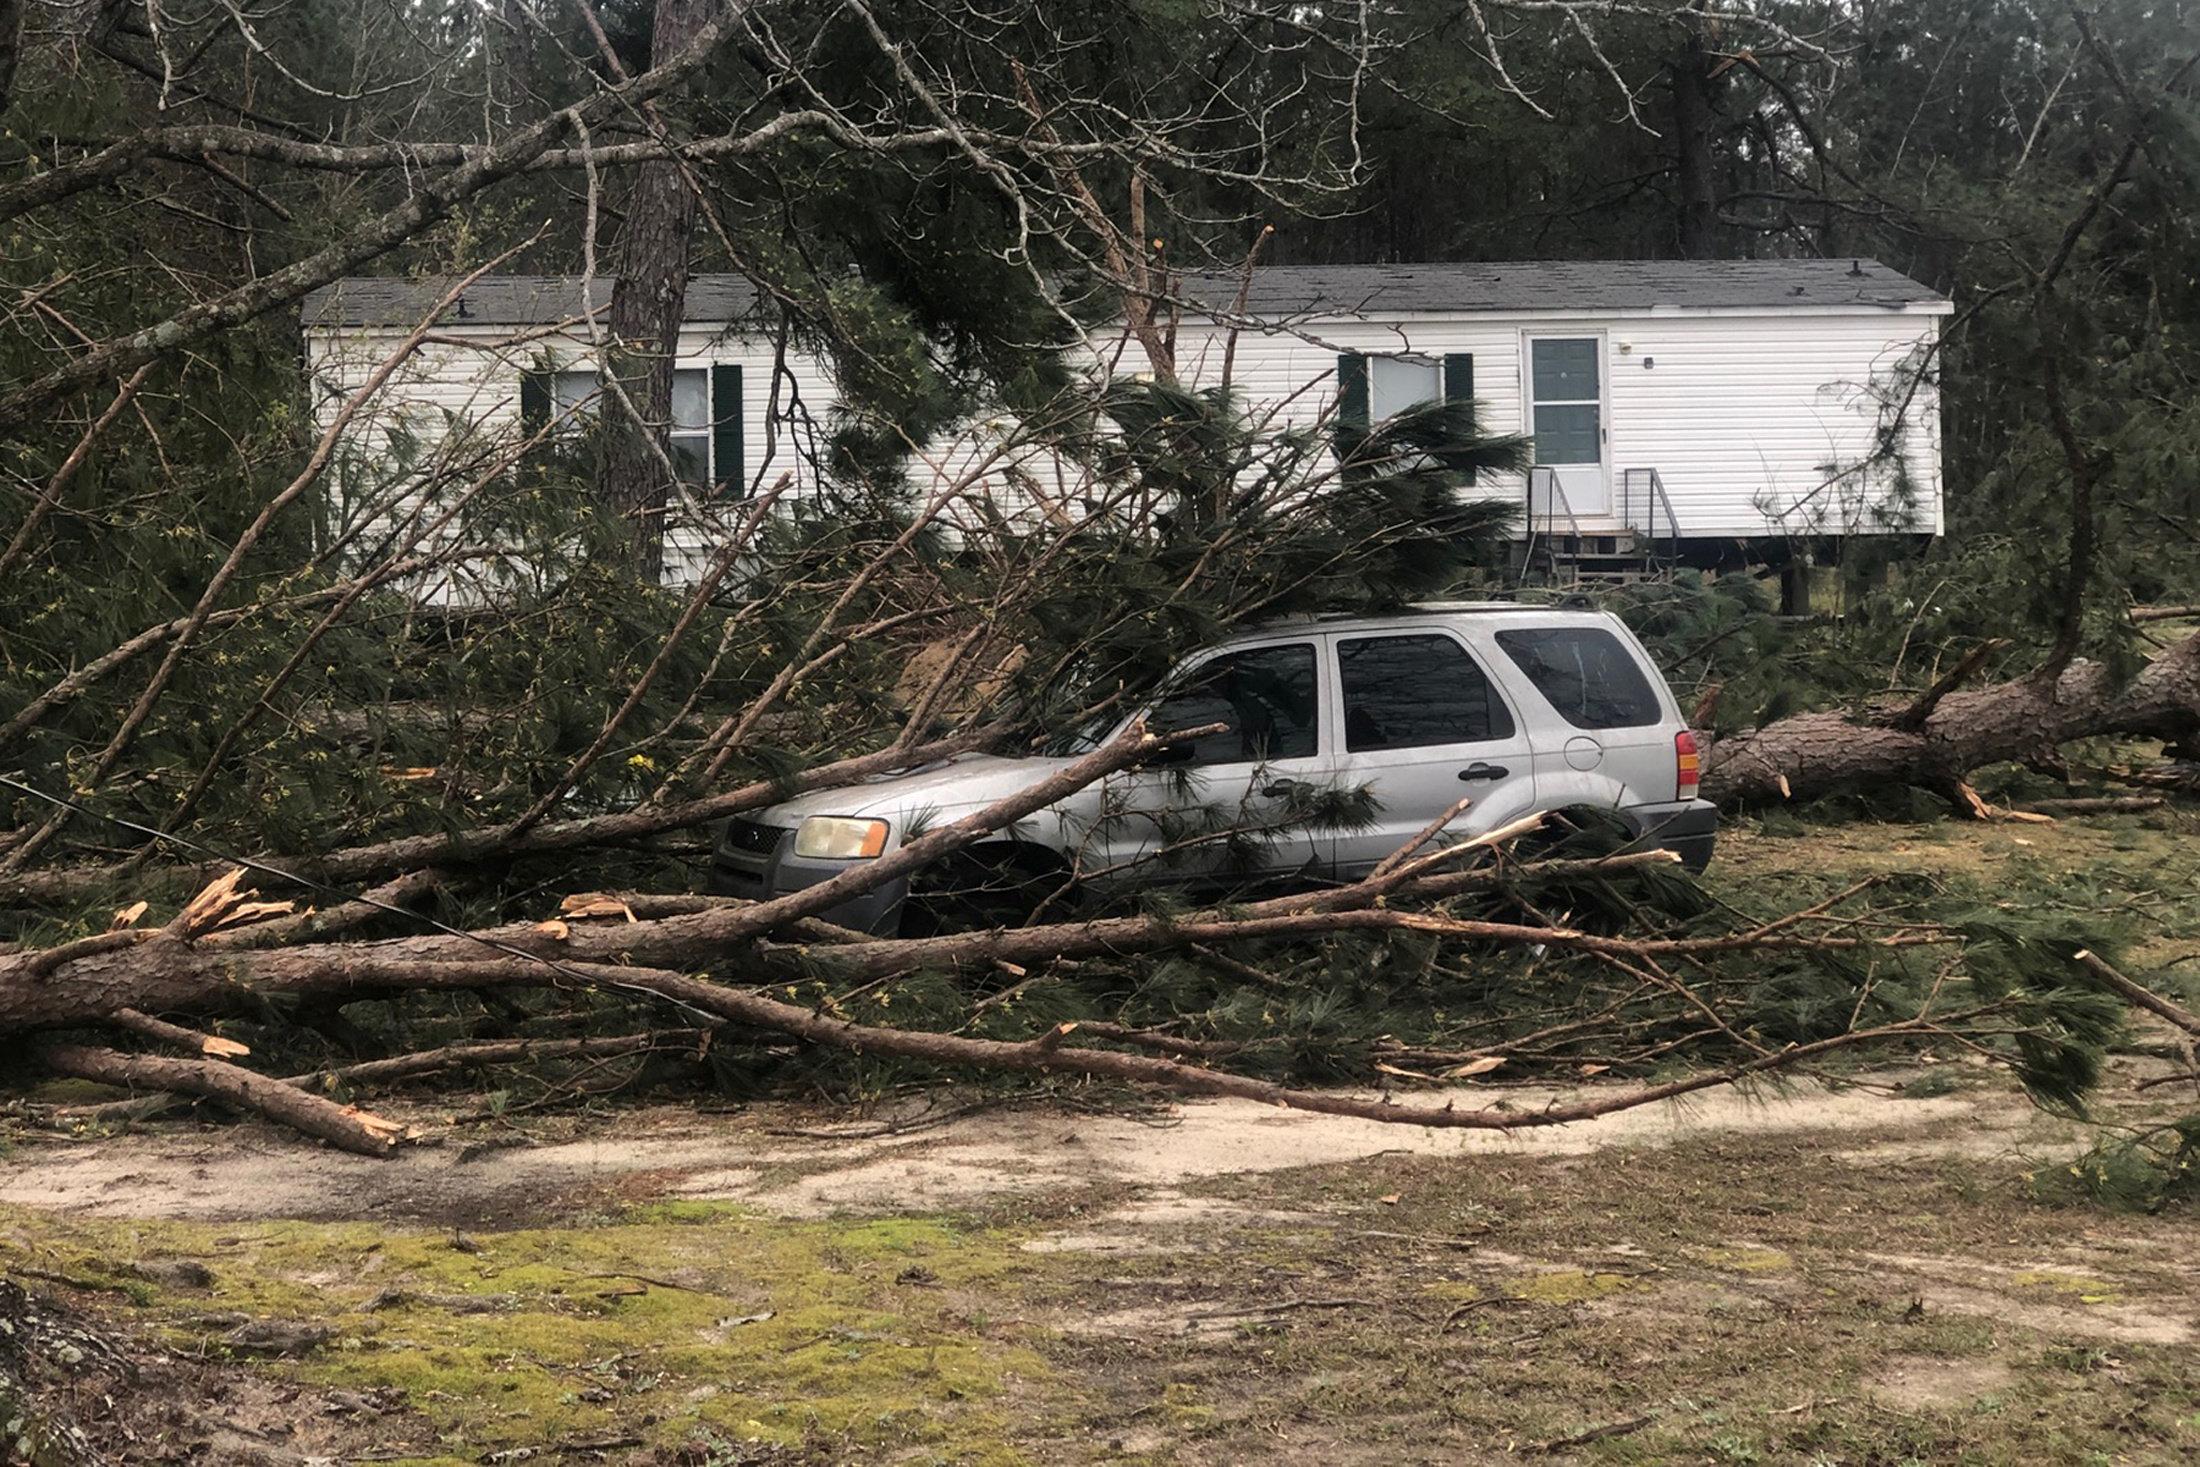 A tree fell on a car in Lee County near Beauregard, Alabama.